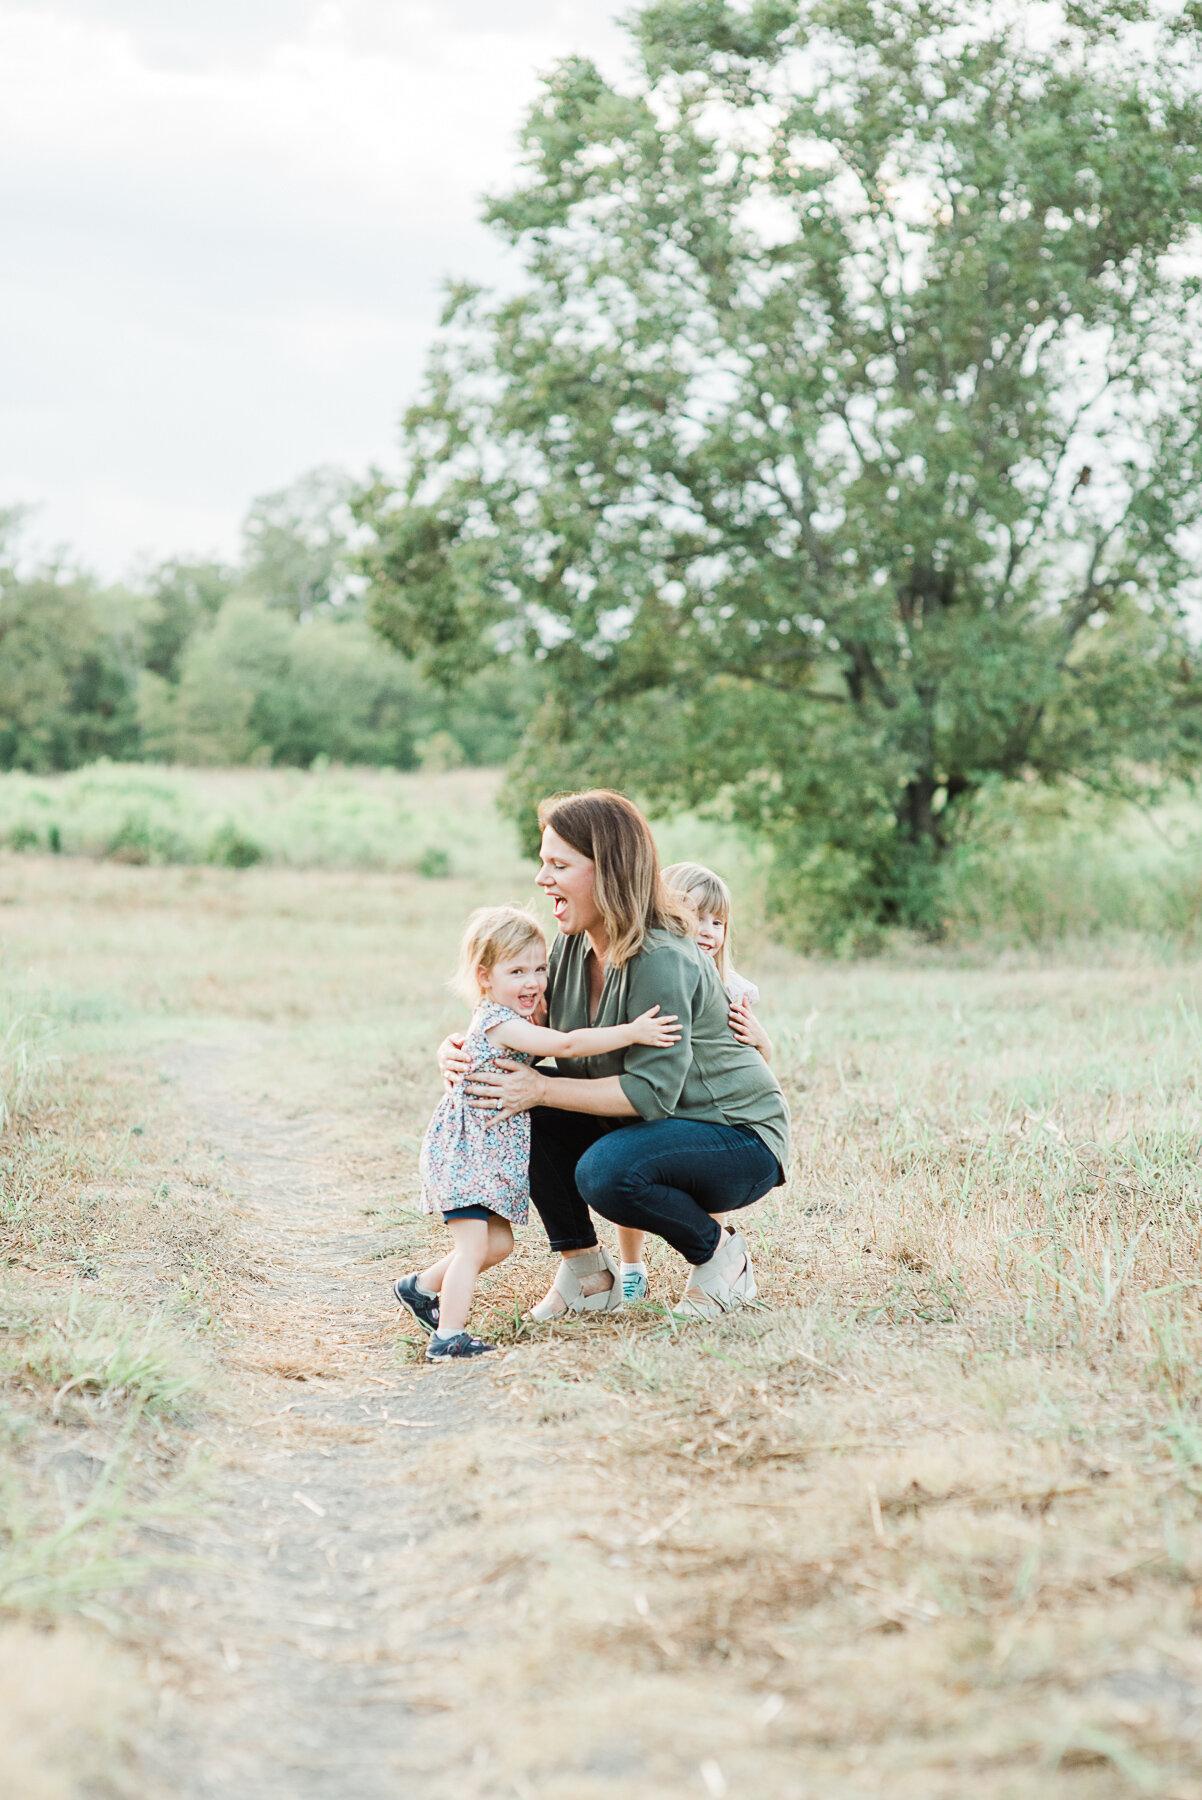 Dallas-Baby-Photographer-Park-Bench-Photography-118.jpg